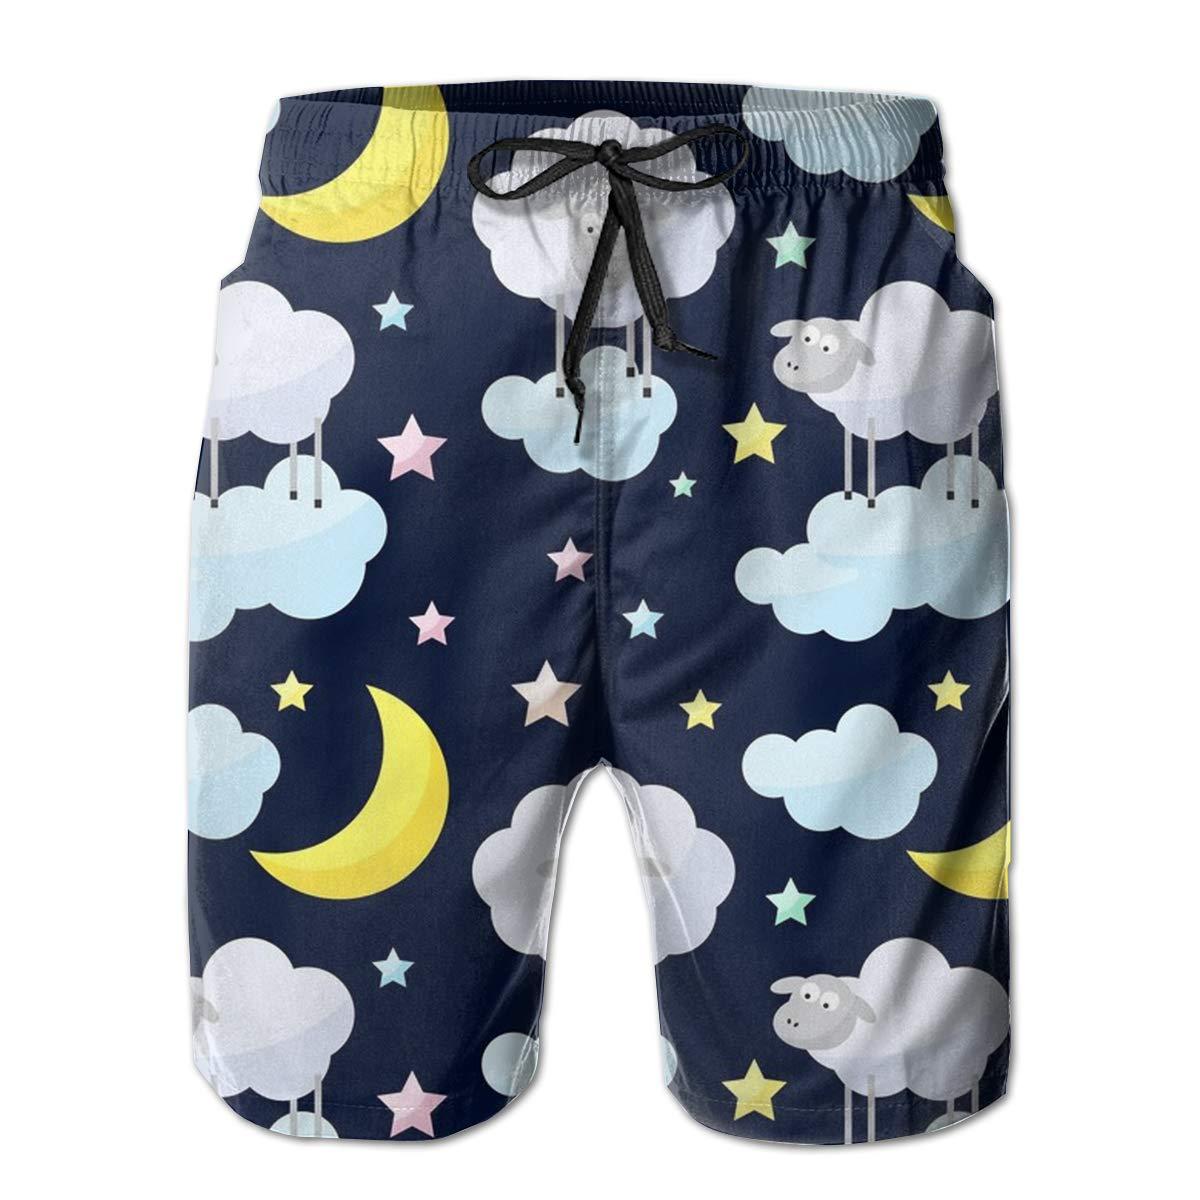 YongColer Boardshort Sheep Star Moonlight Boys Teen Quick Dry Sports Trunks